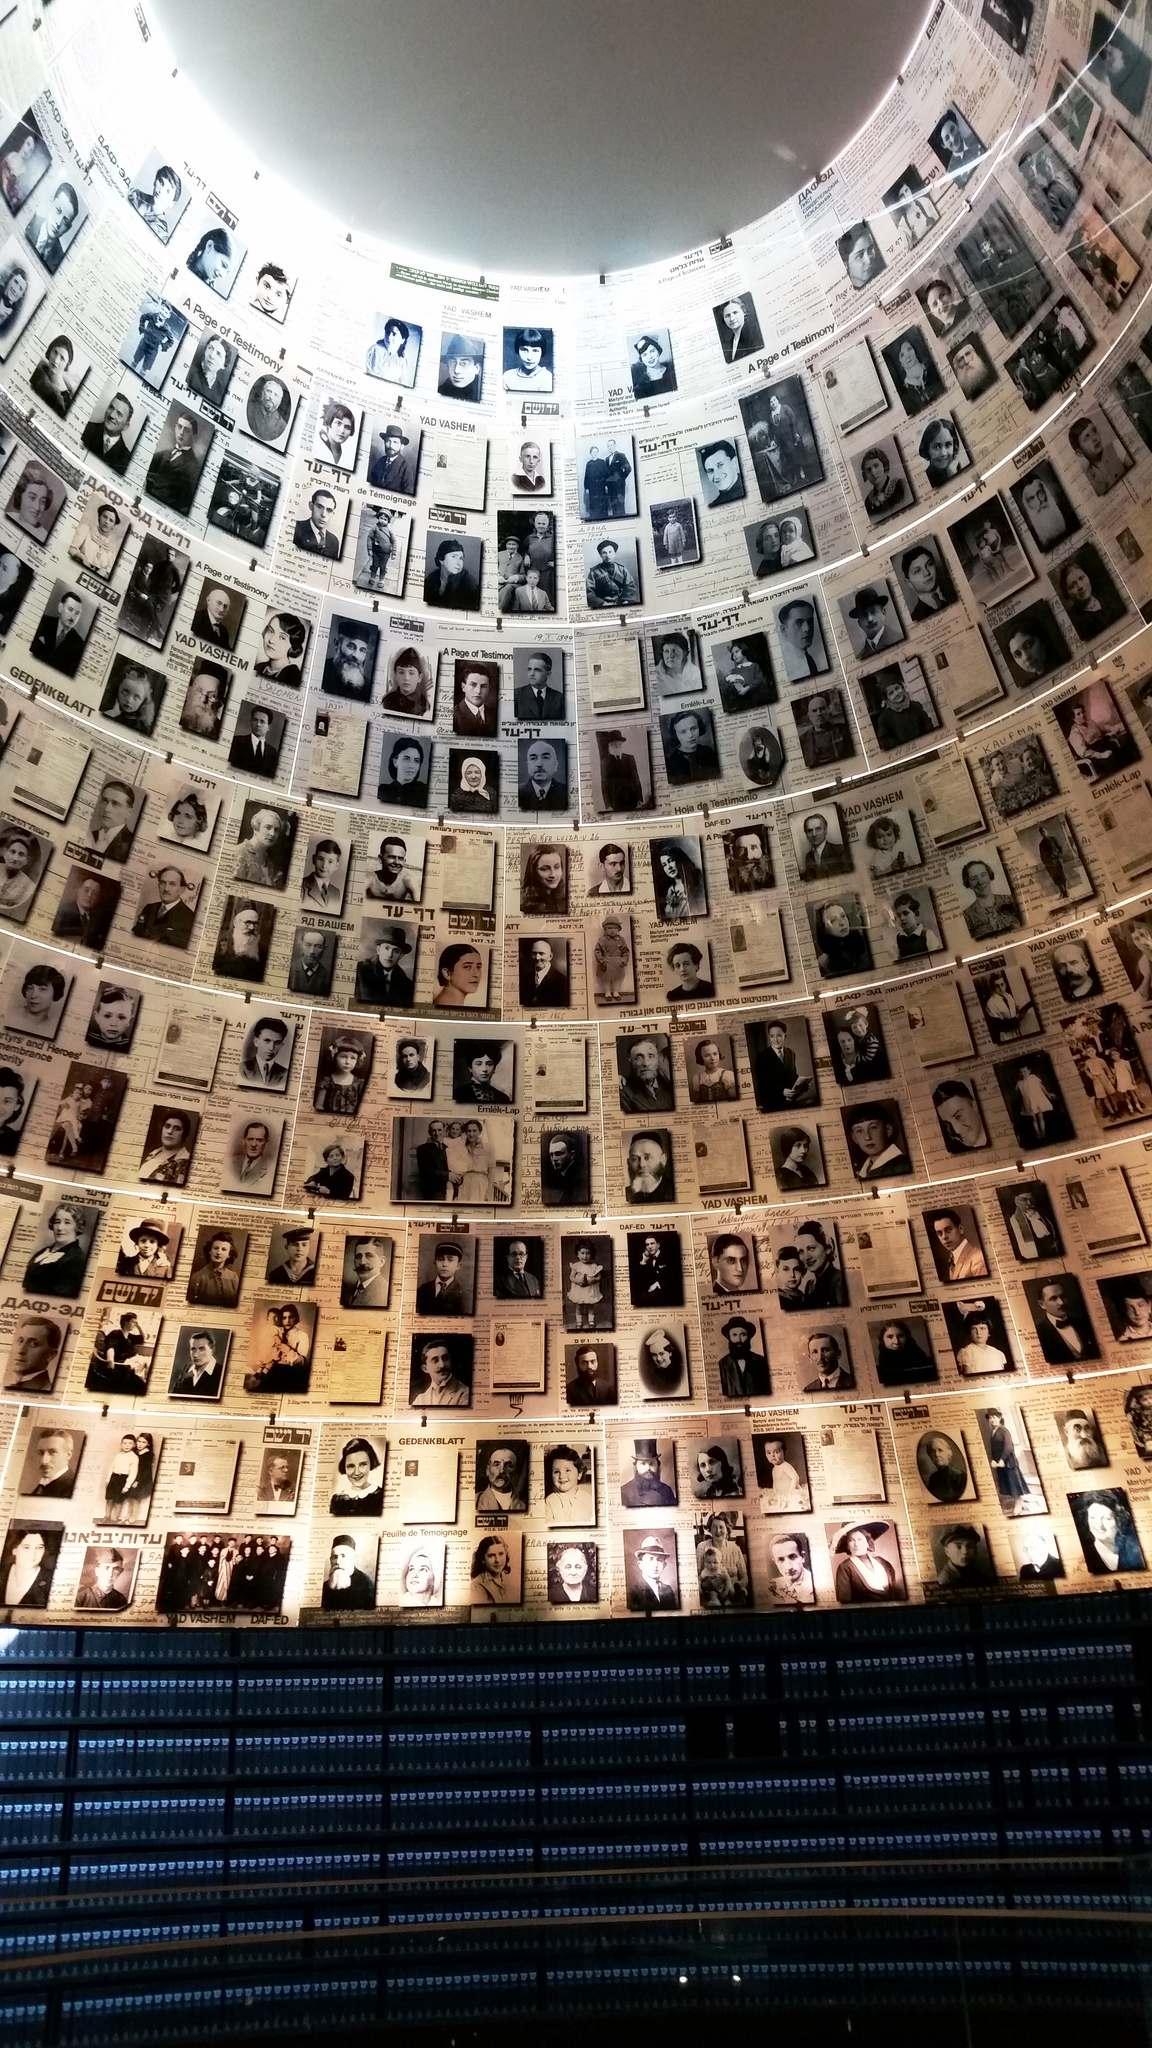 yad vashem1 The World Holocaust Remembrance Center, Israel